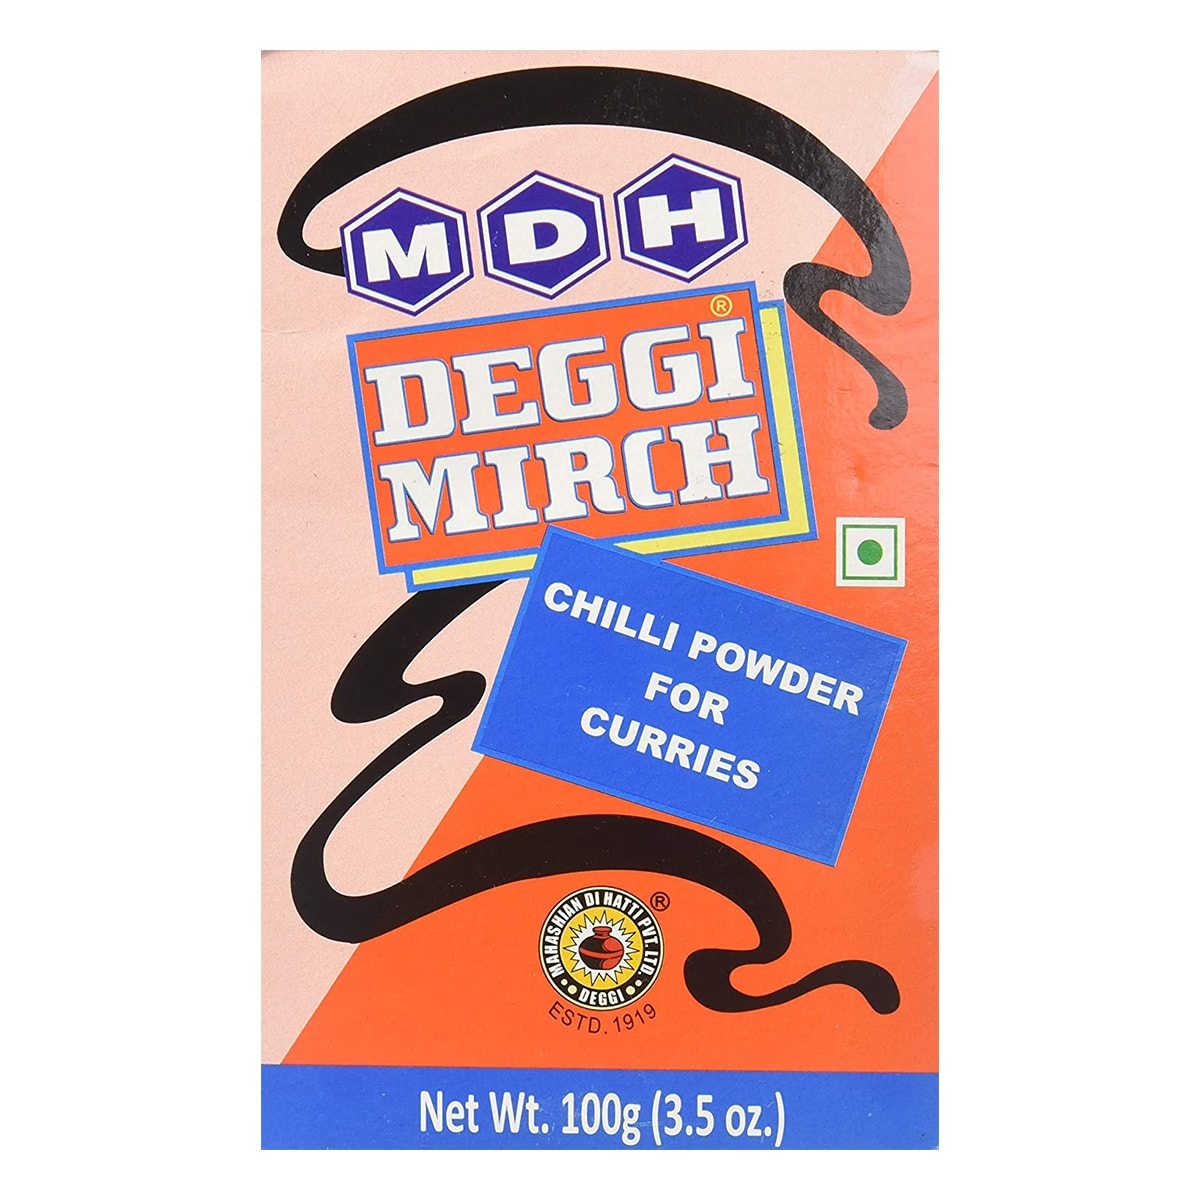 Buy MDH Deggi Mirch (Chilli Powder for Curries) - 100 gm